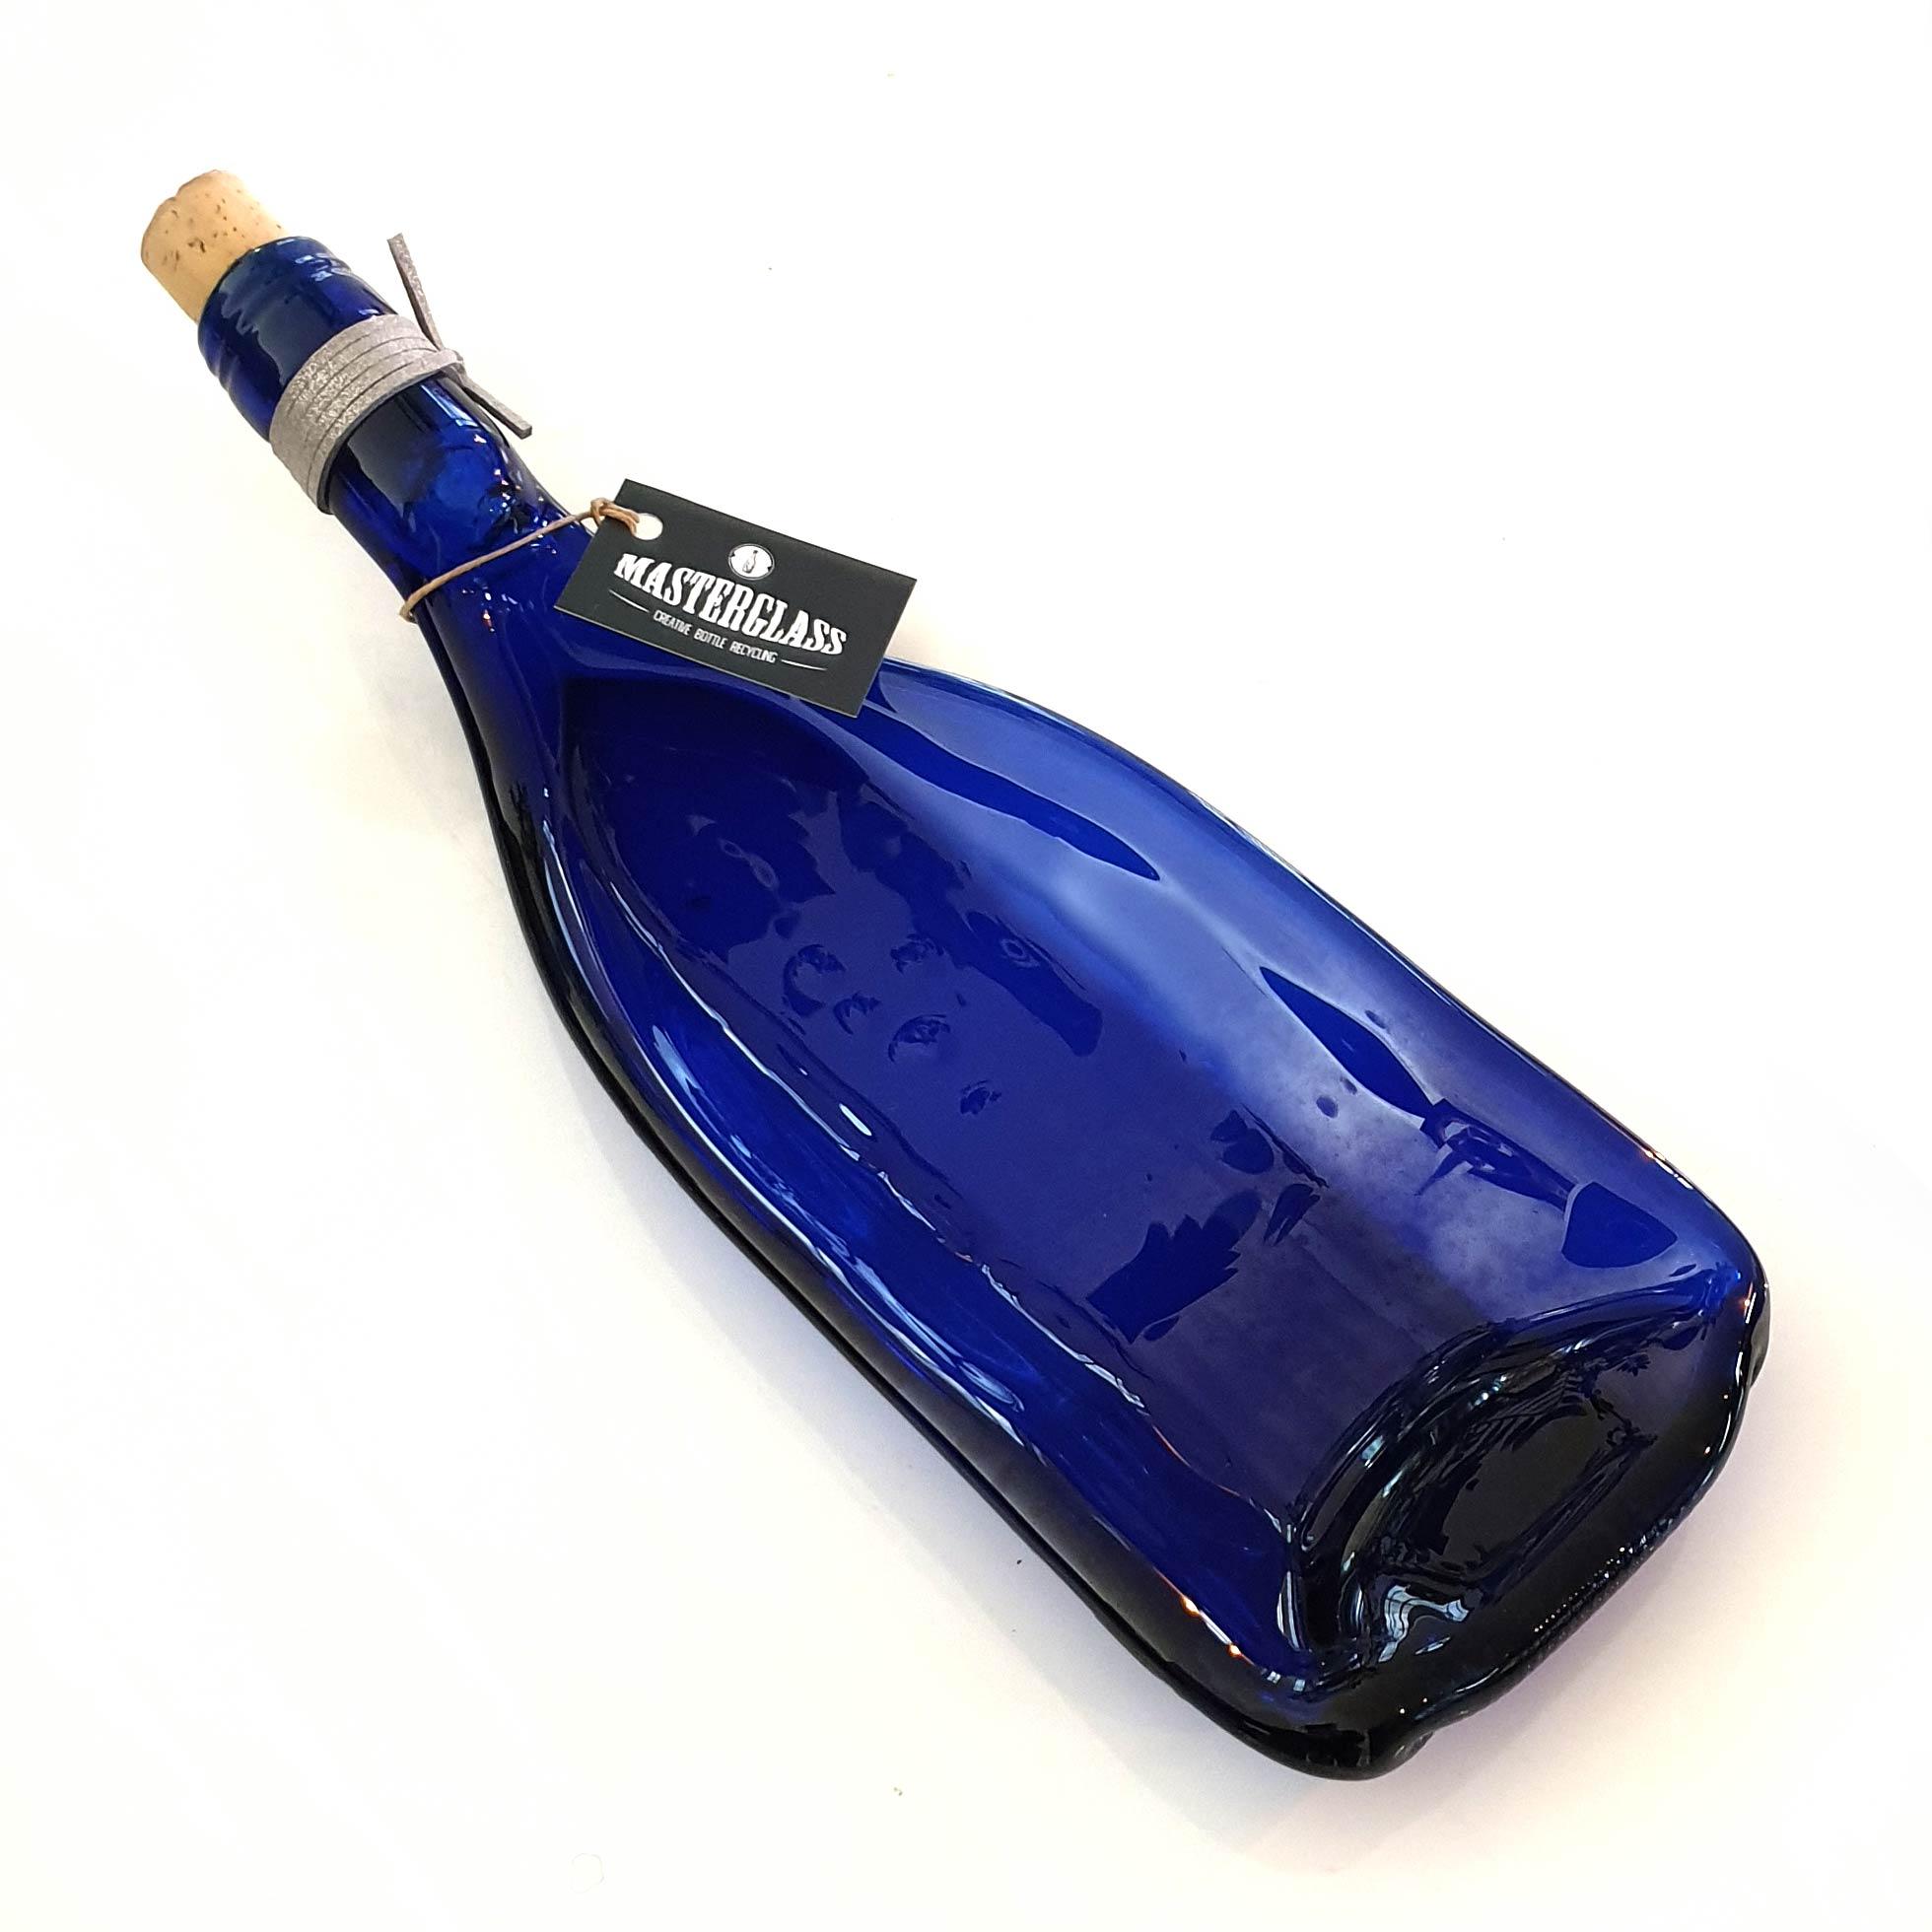 Tot borrelplank gesmolten fles Blue-Lagoon